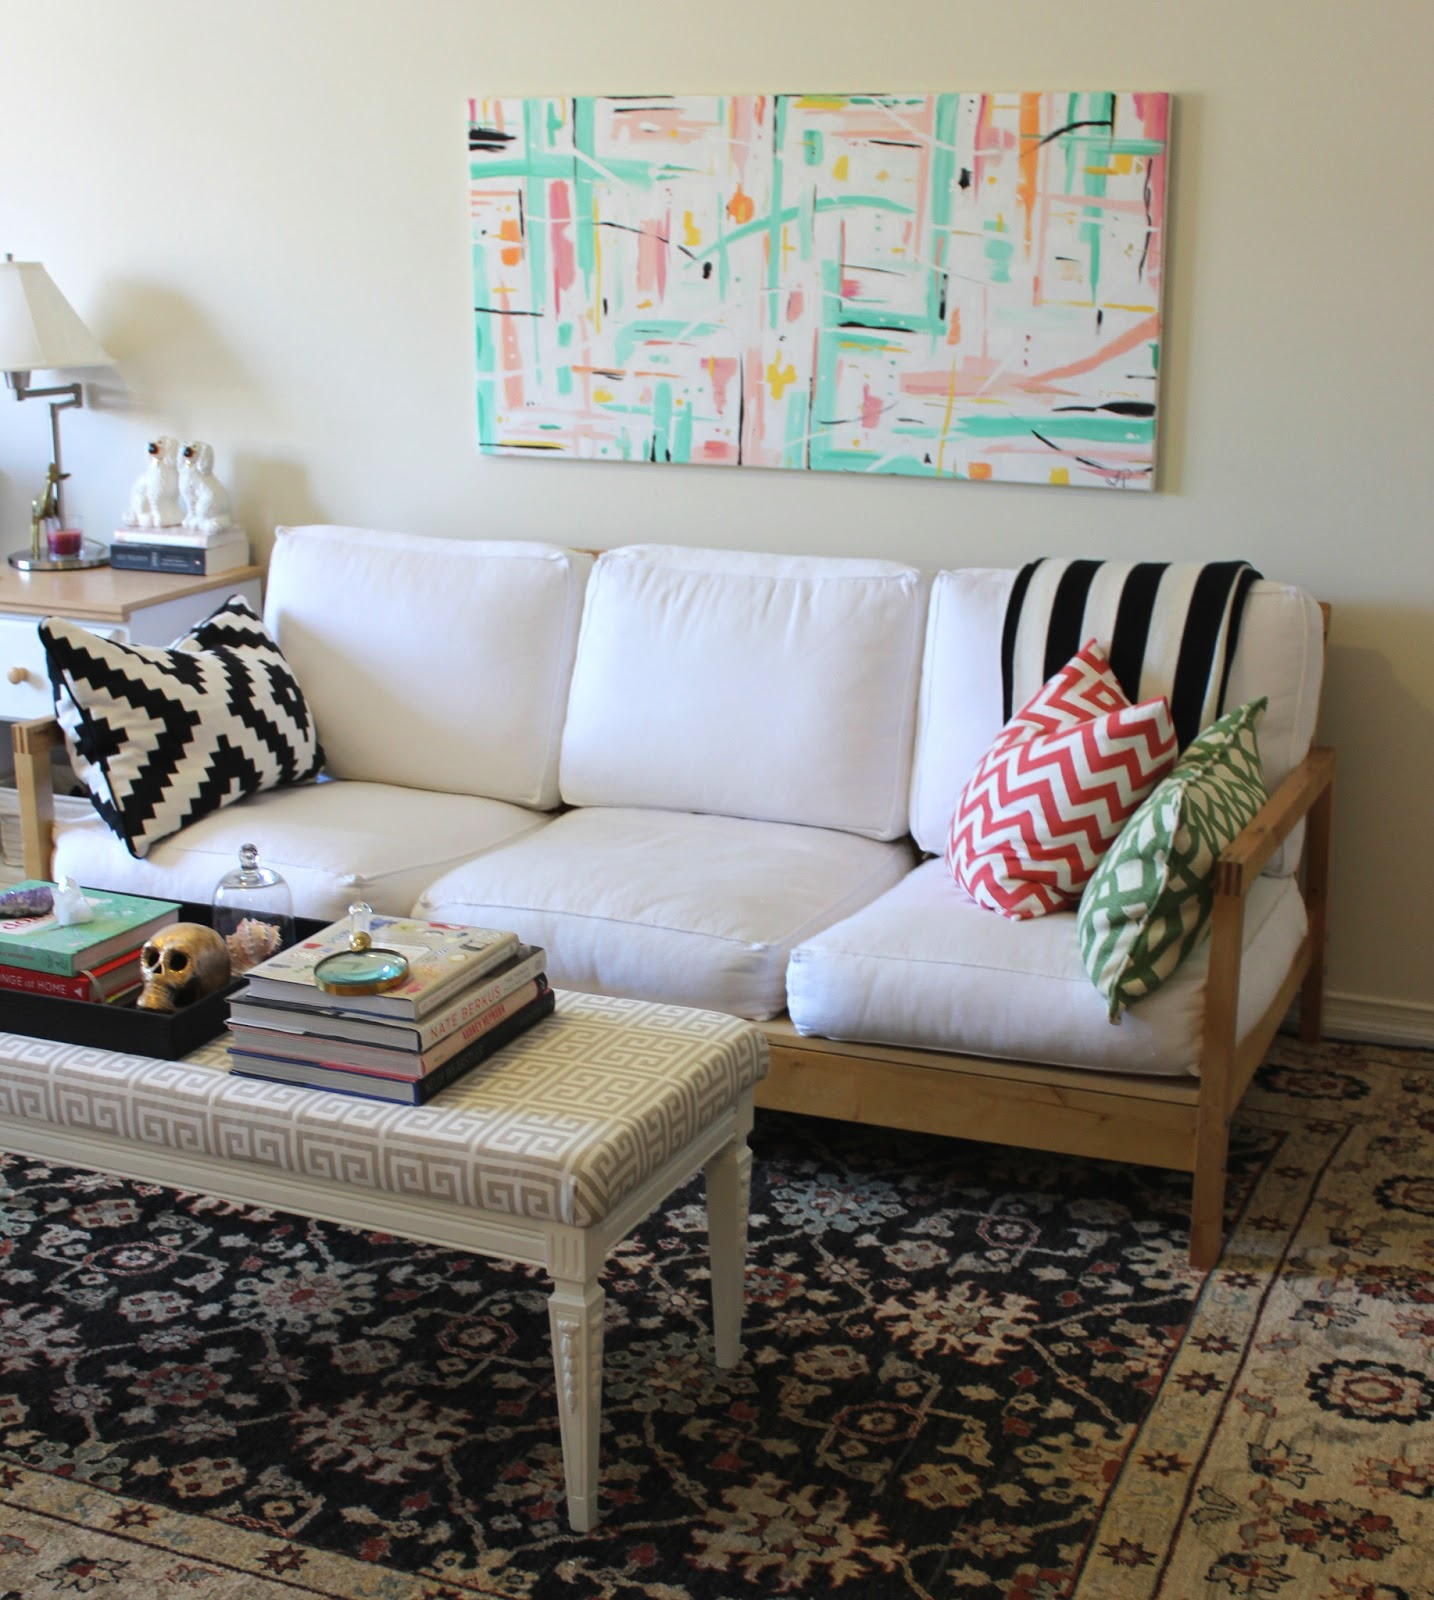 Diy Disine Interier: Tiffany Leigh Interior Design: DIY